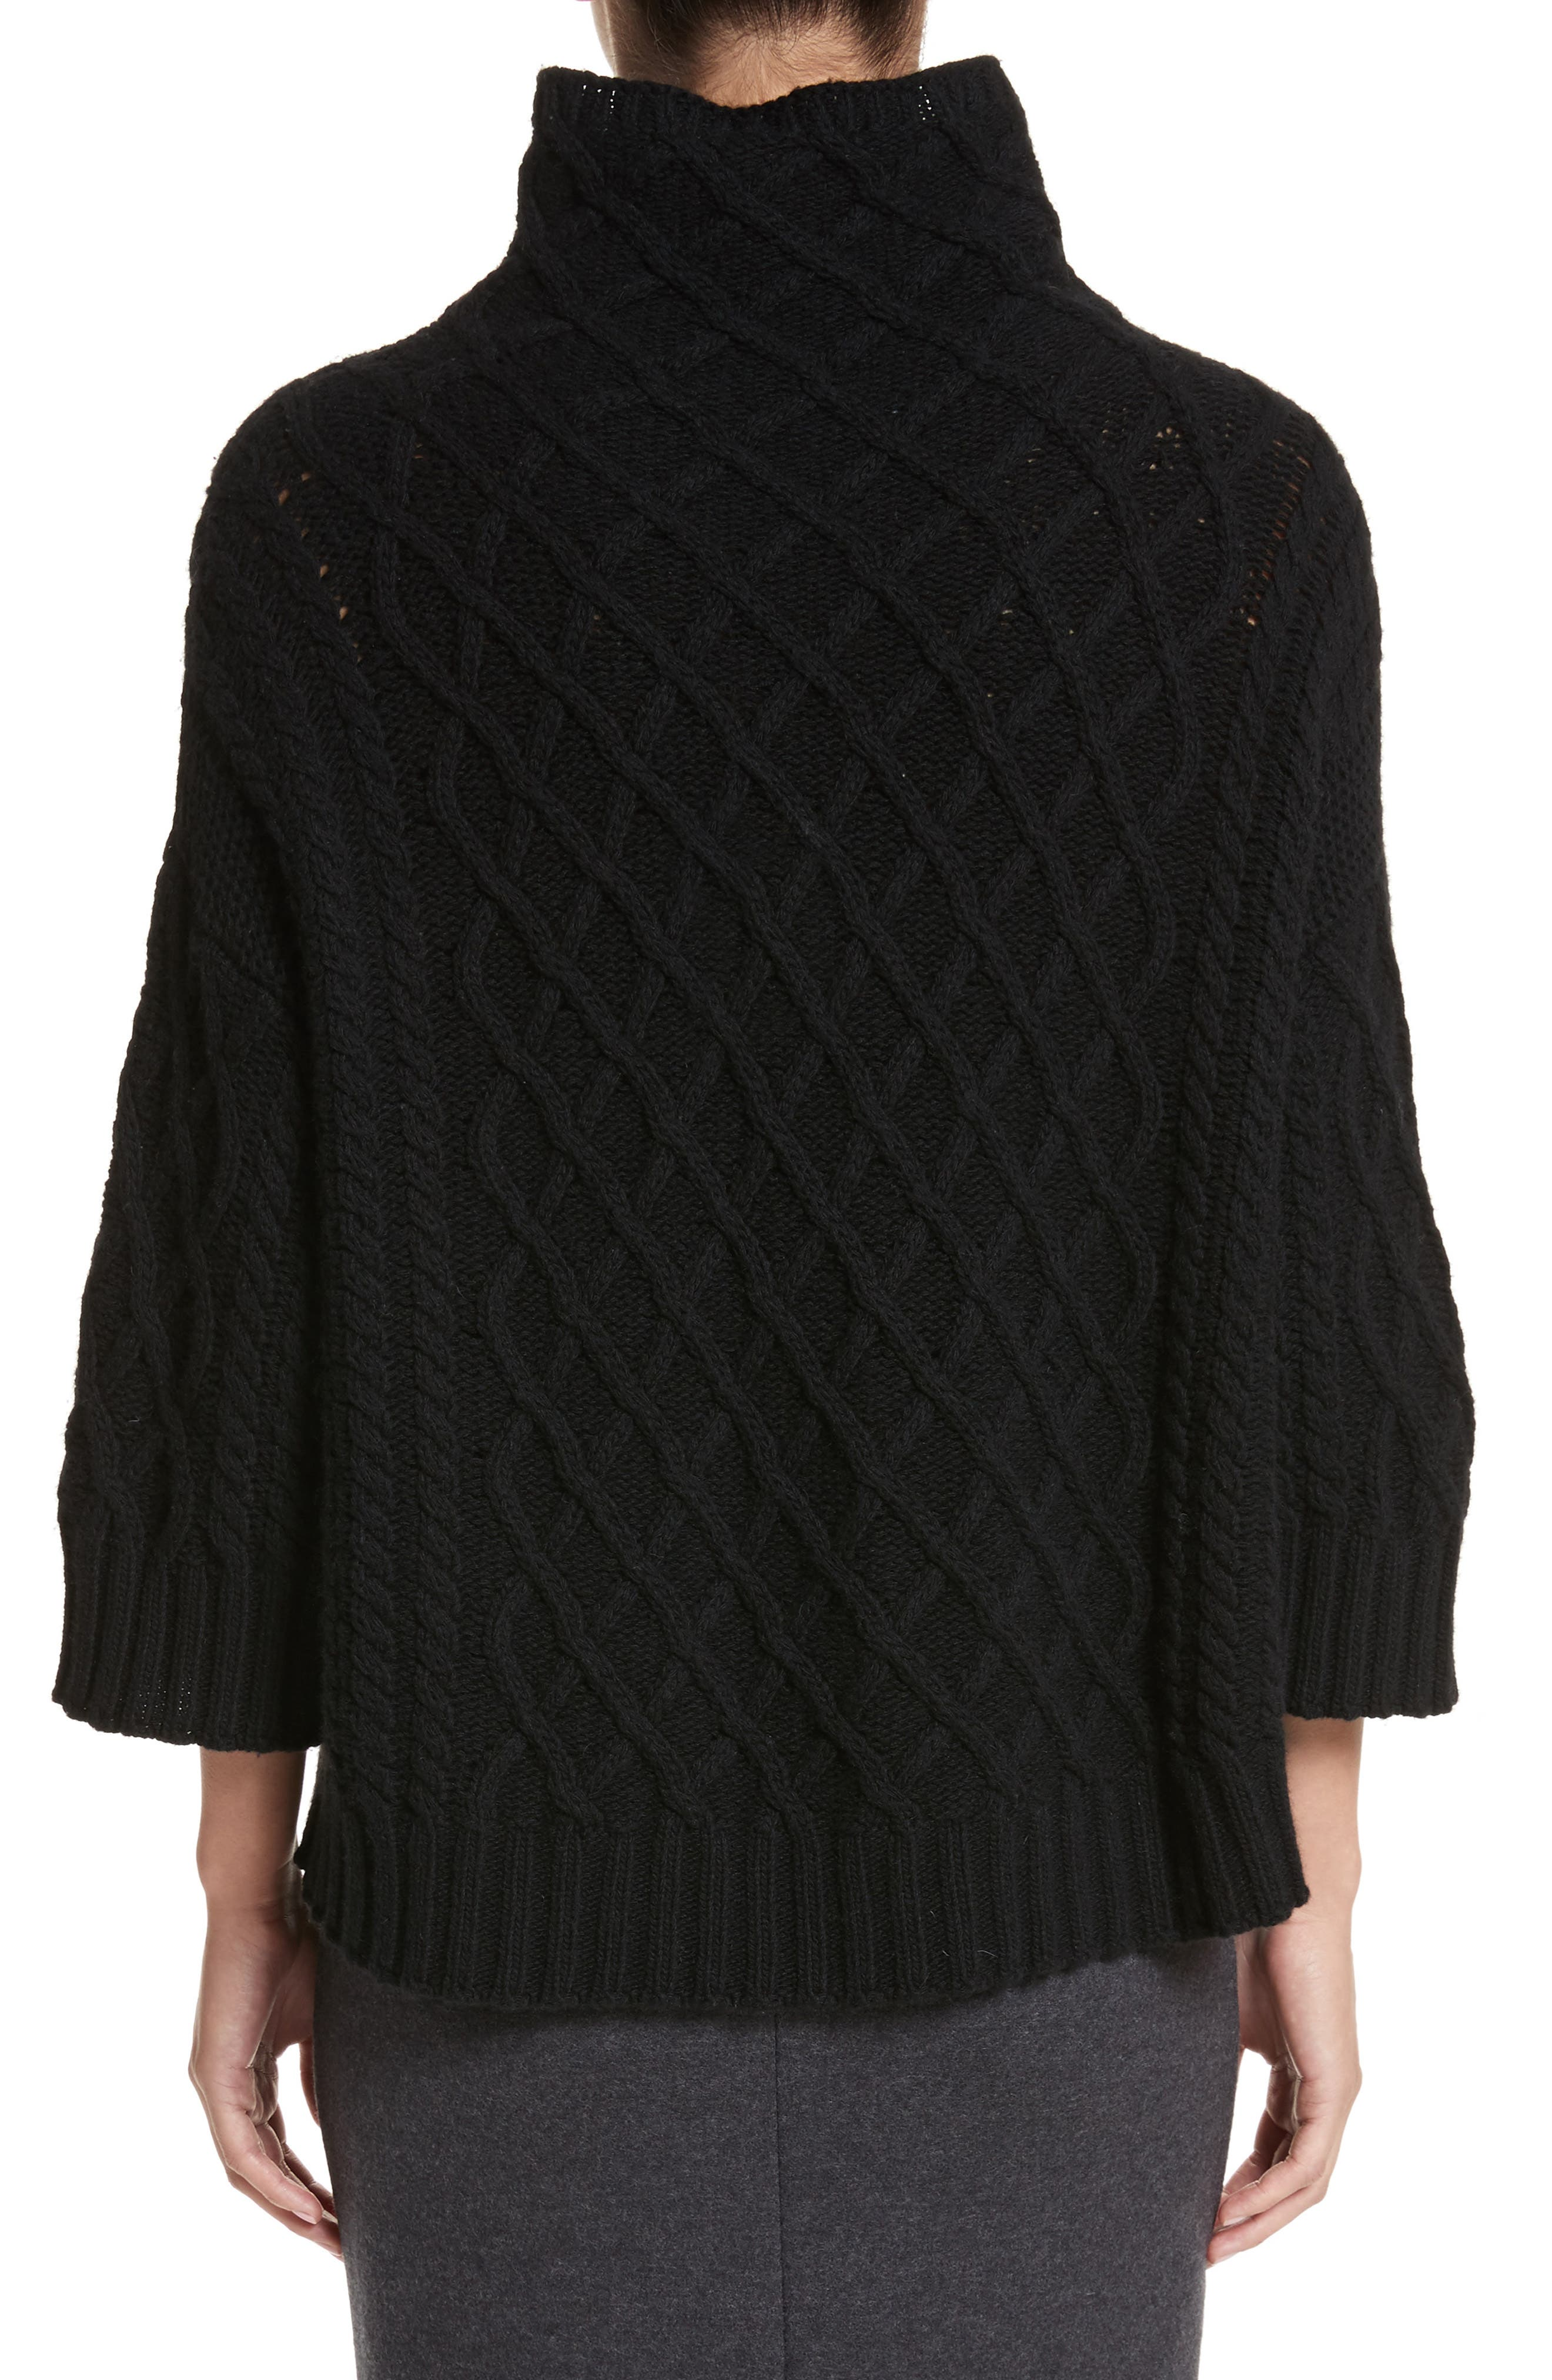 Alternate Image 2  - Max Mara Cantone Wool & Cashmere Funnel Neck Sweater